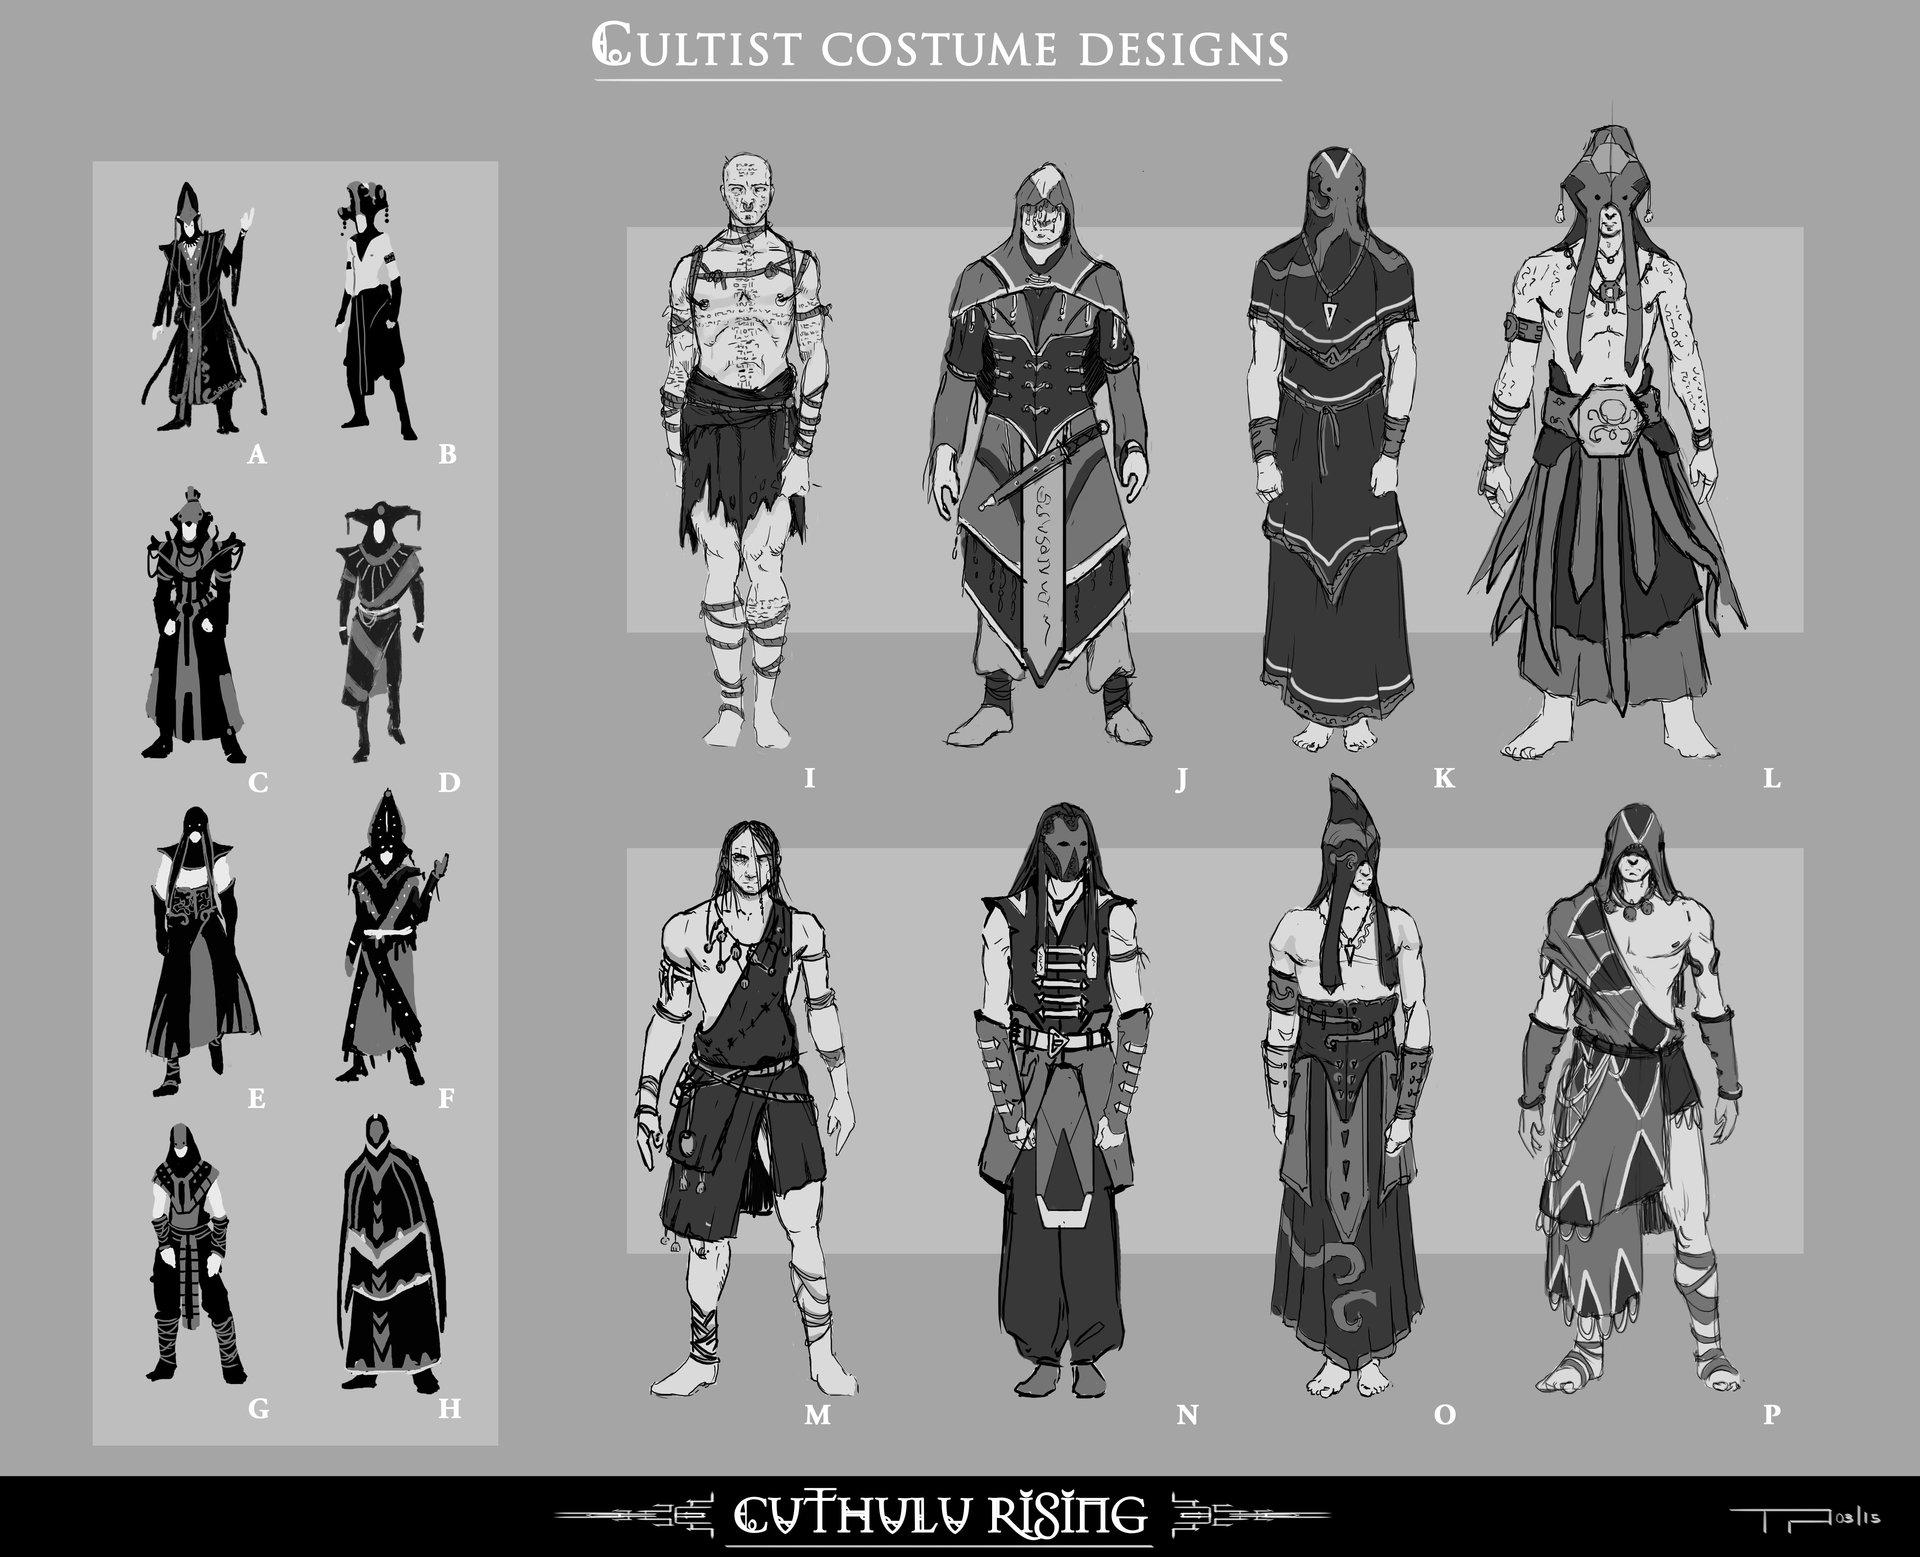 Timo peter cultist costume design